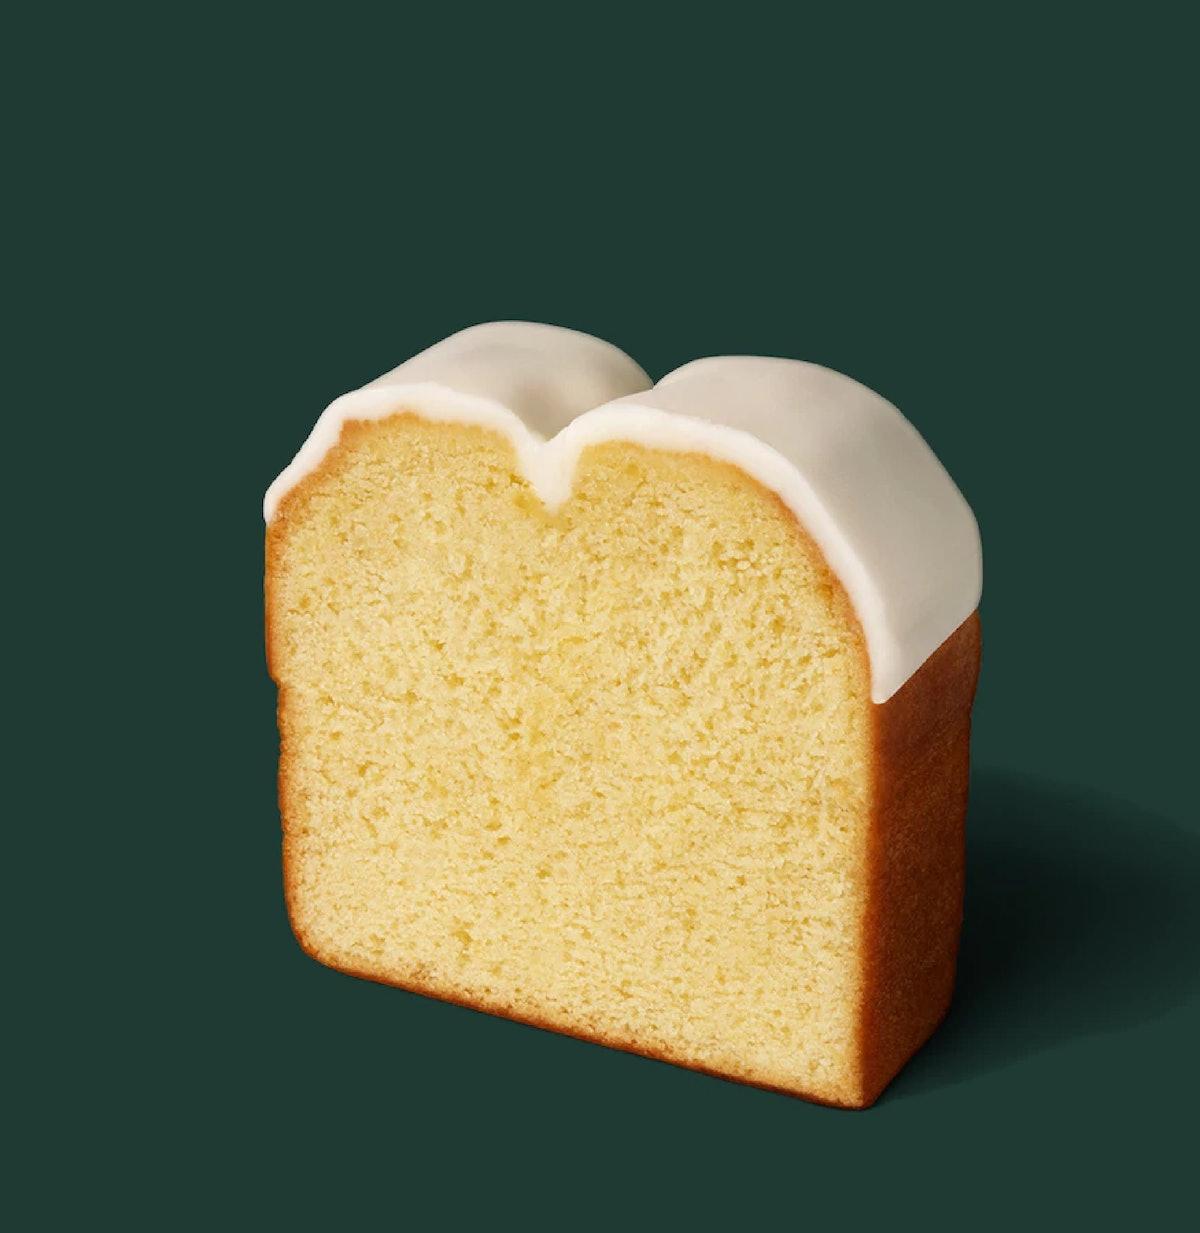 This viral TikTok of Starbucks Lemon Loaf dupe at Walmart seems like a tasty option.